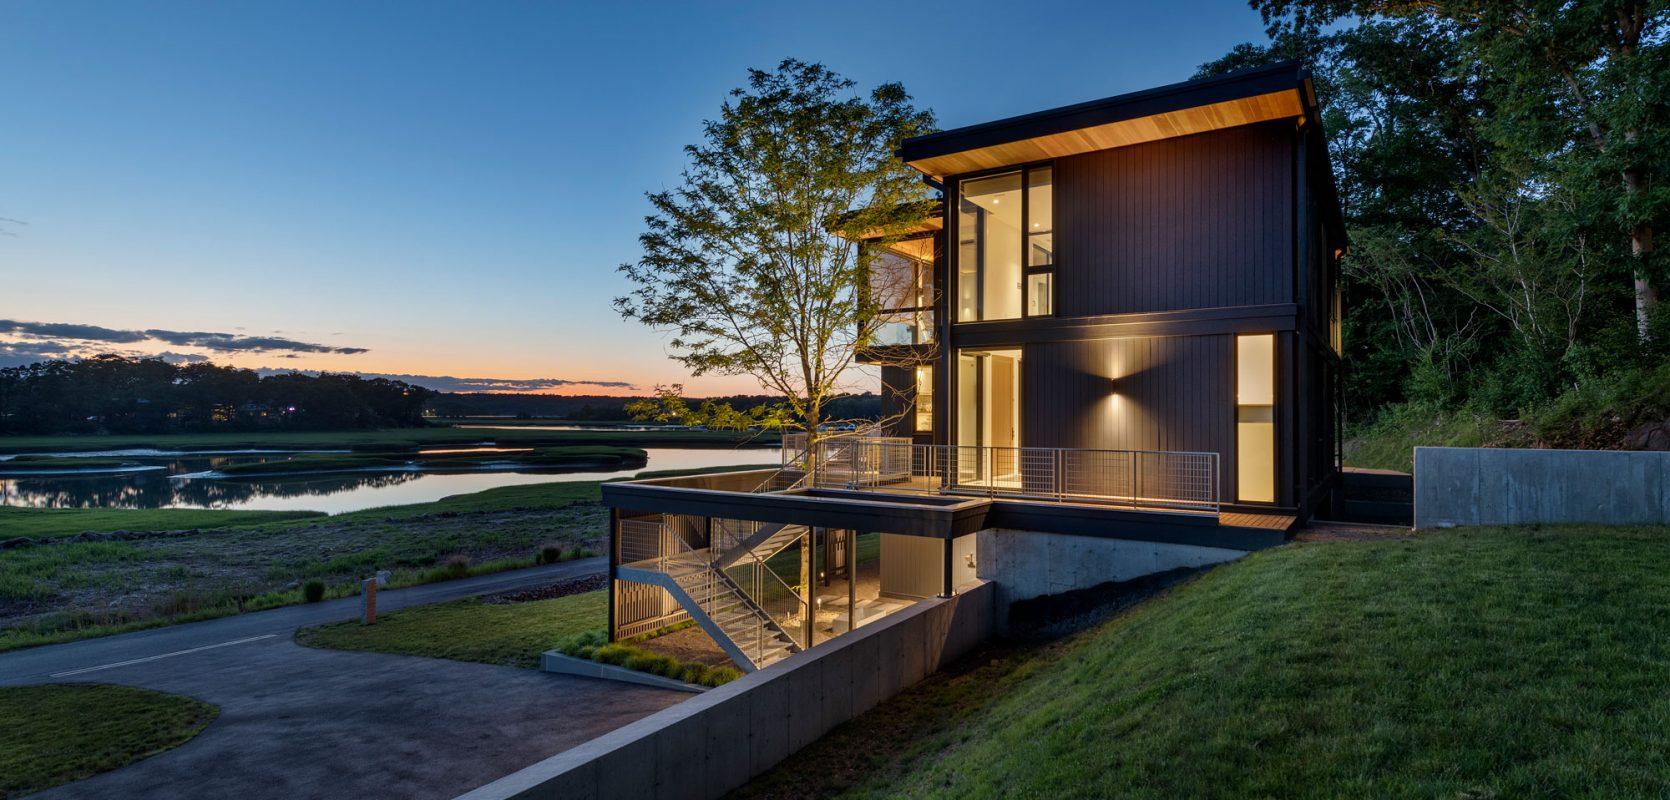 dusk shot of glowing home overlooking the marsh